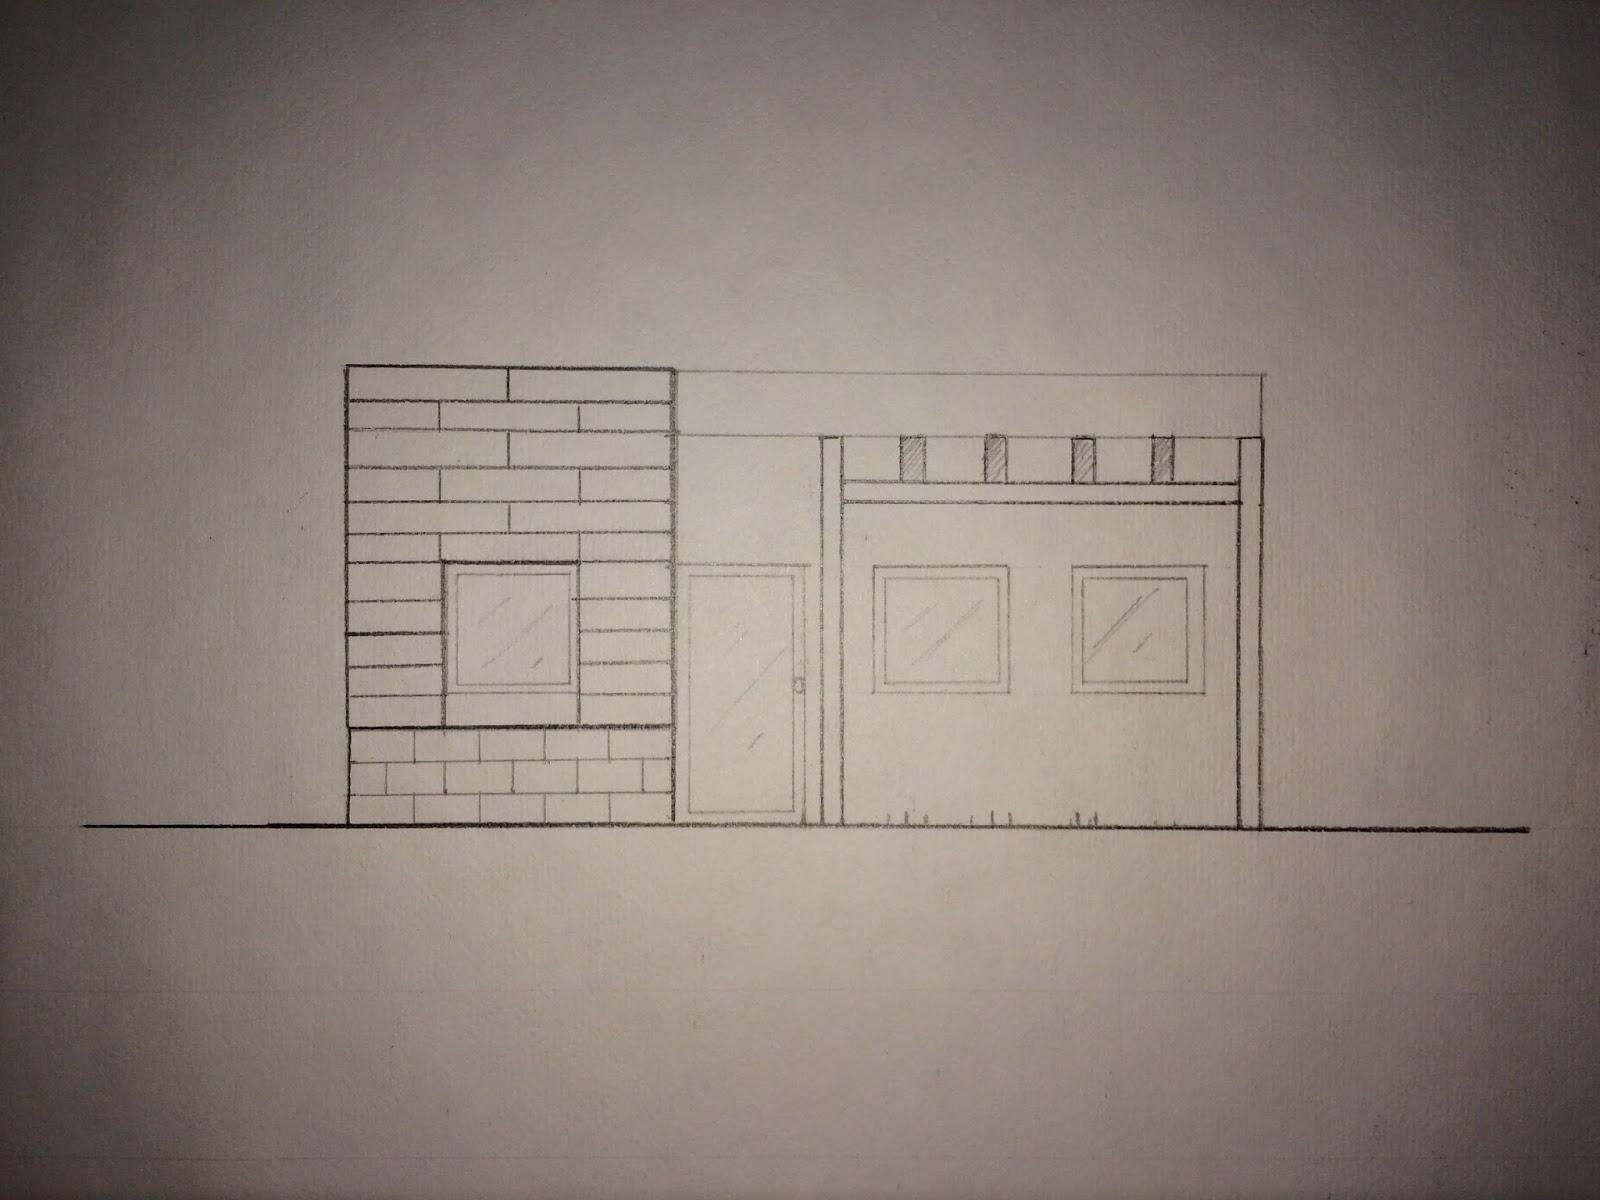 Architectsunited proyecto casa habitaci n for Proyecto casa habitacion minimalista